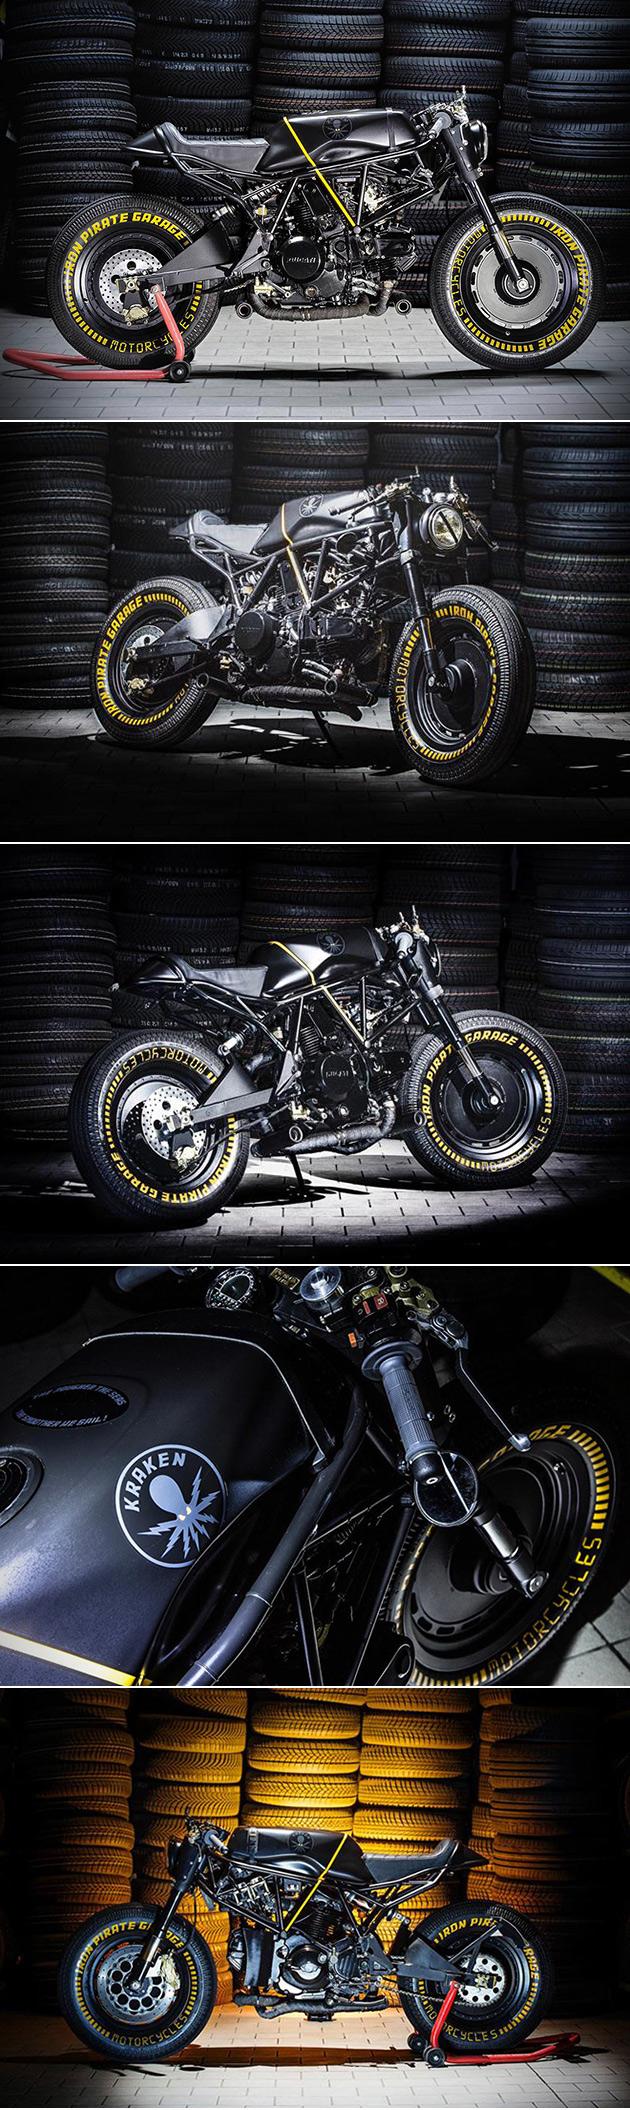 Ducati 750 SS Kraken